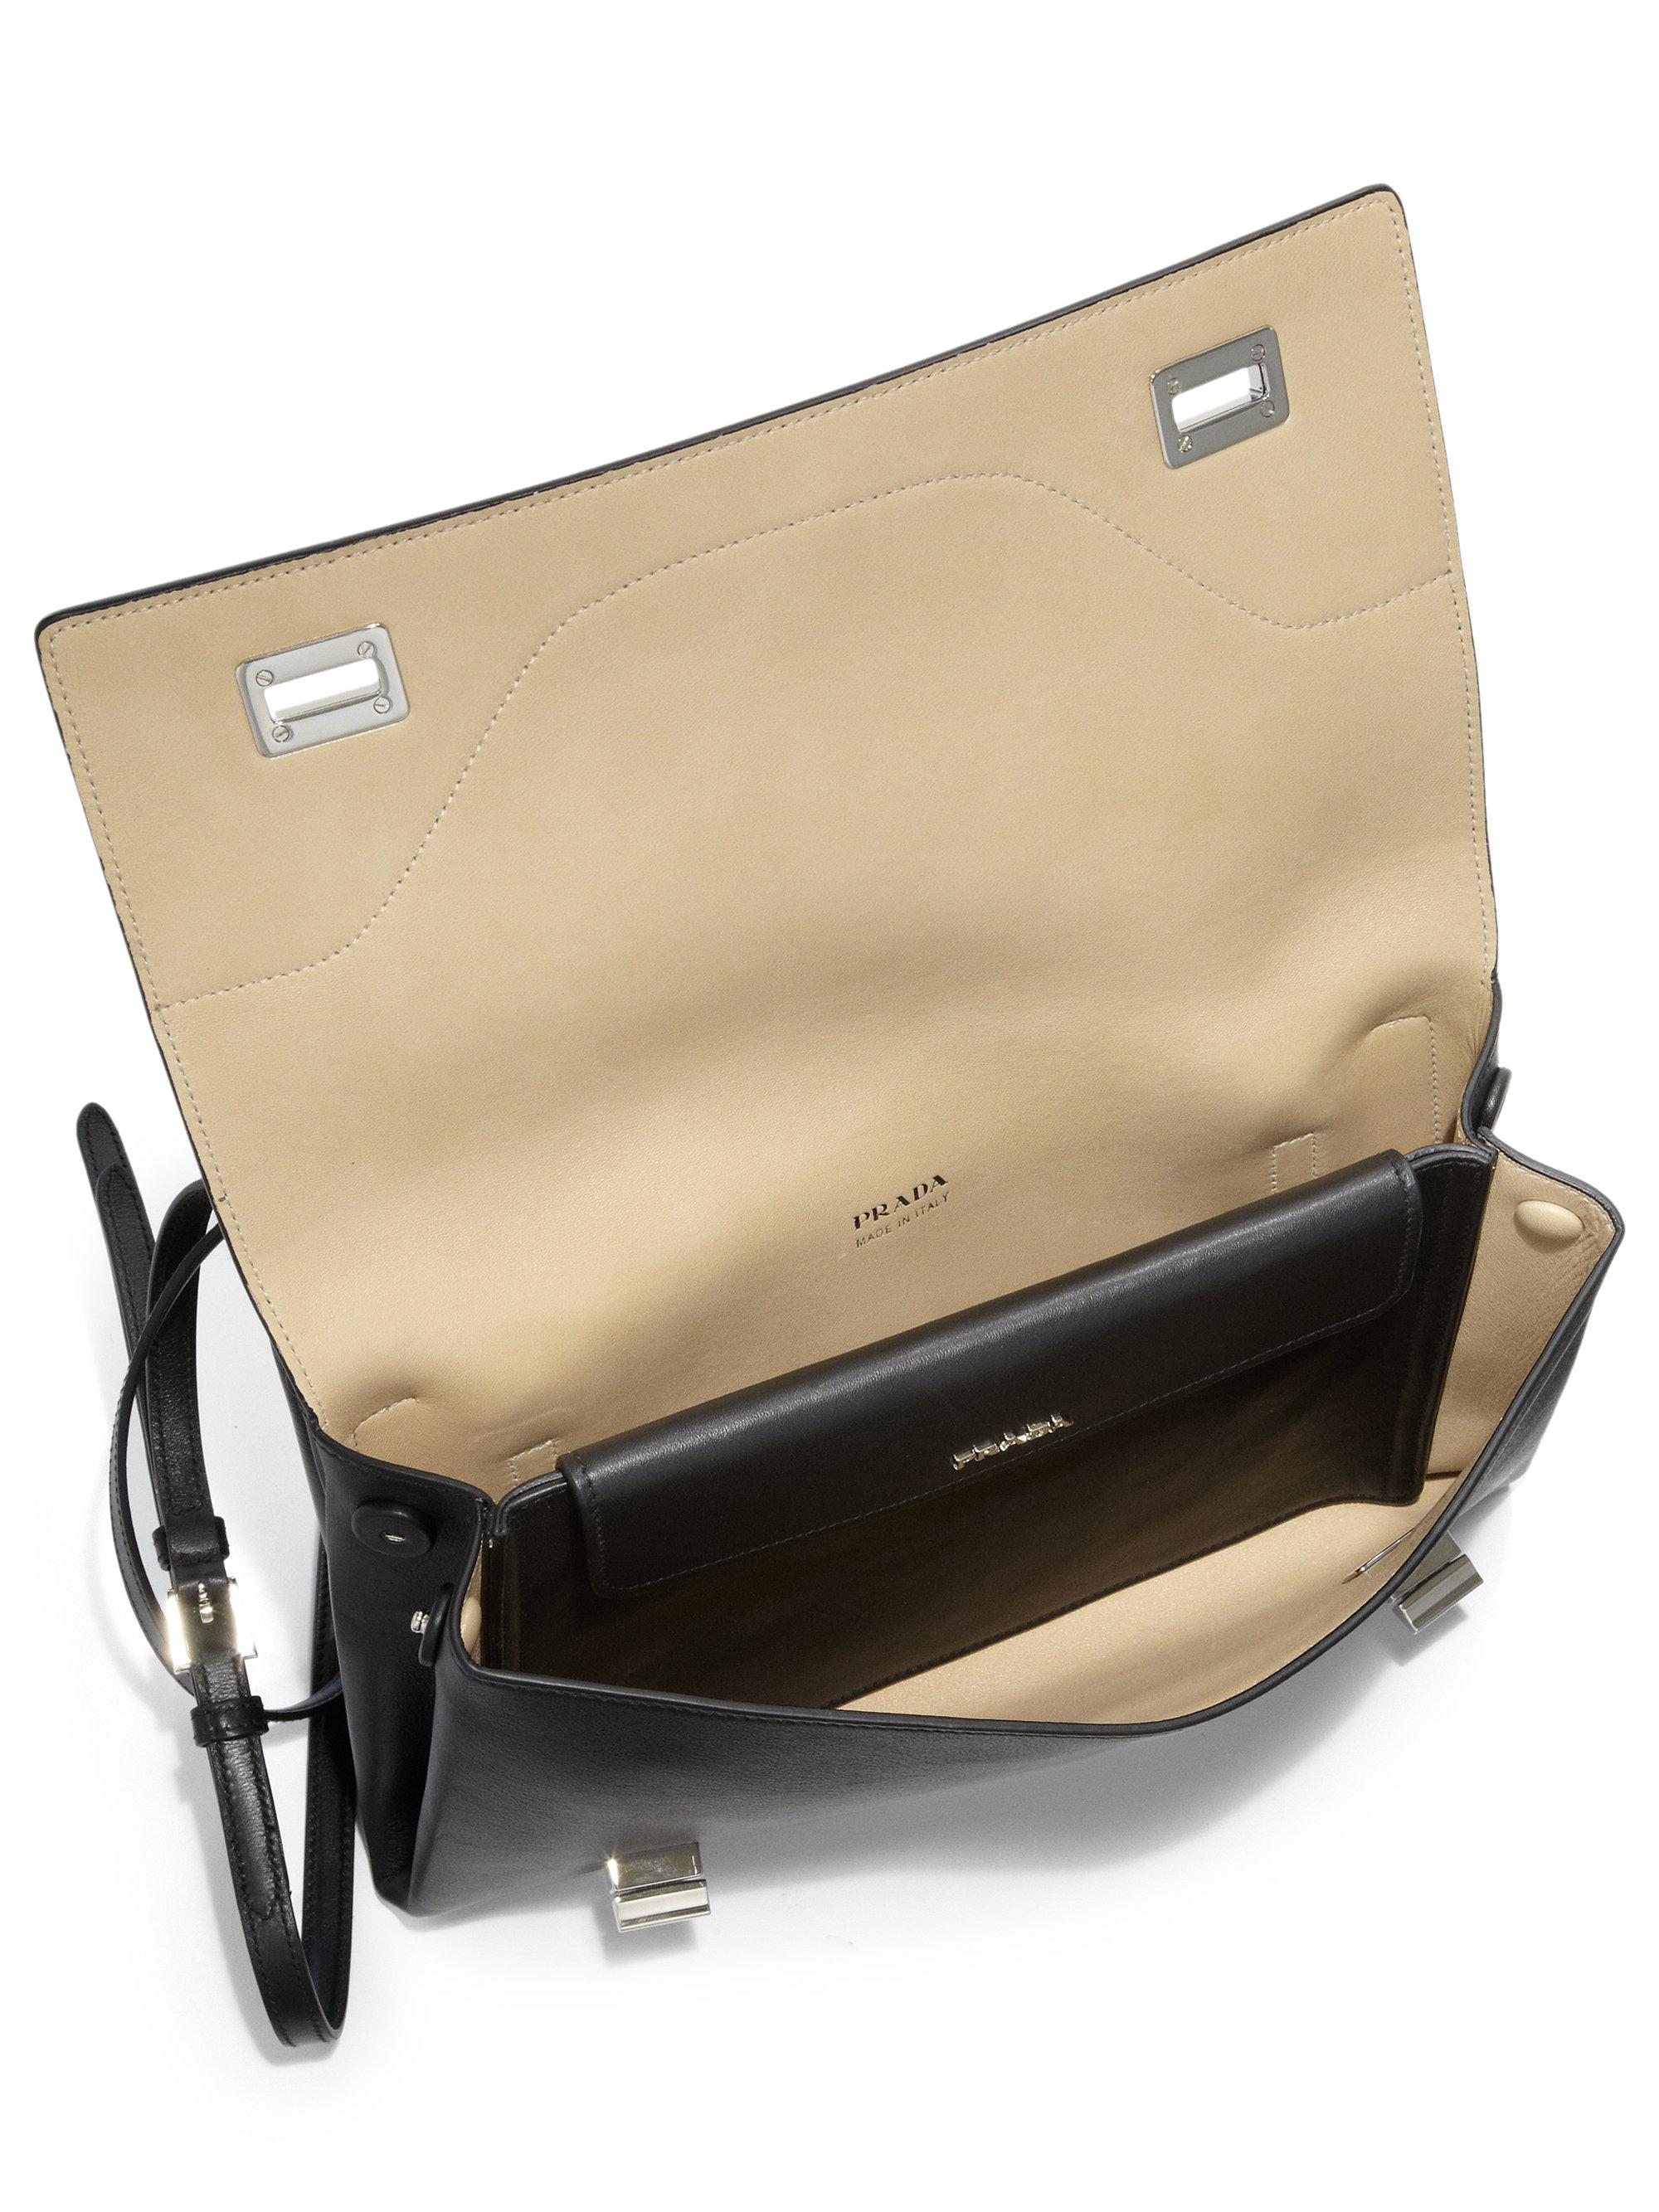 prada messenger bag sale - Prada Vitello Soft Double Shoulder Bag in Black (BLACK-CREAM) | Lyst